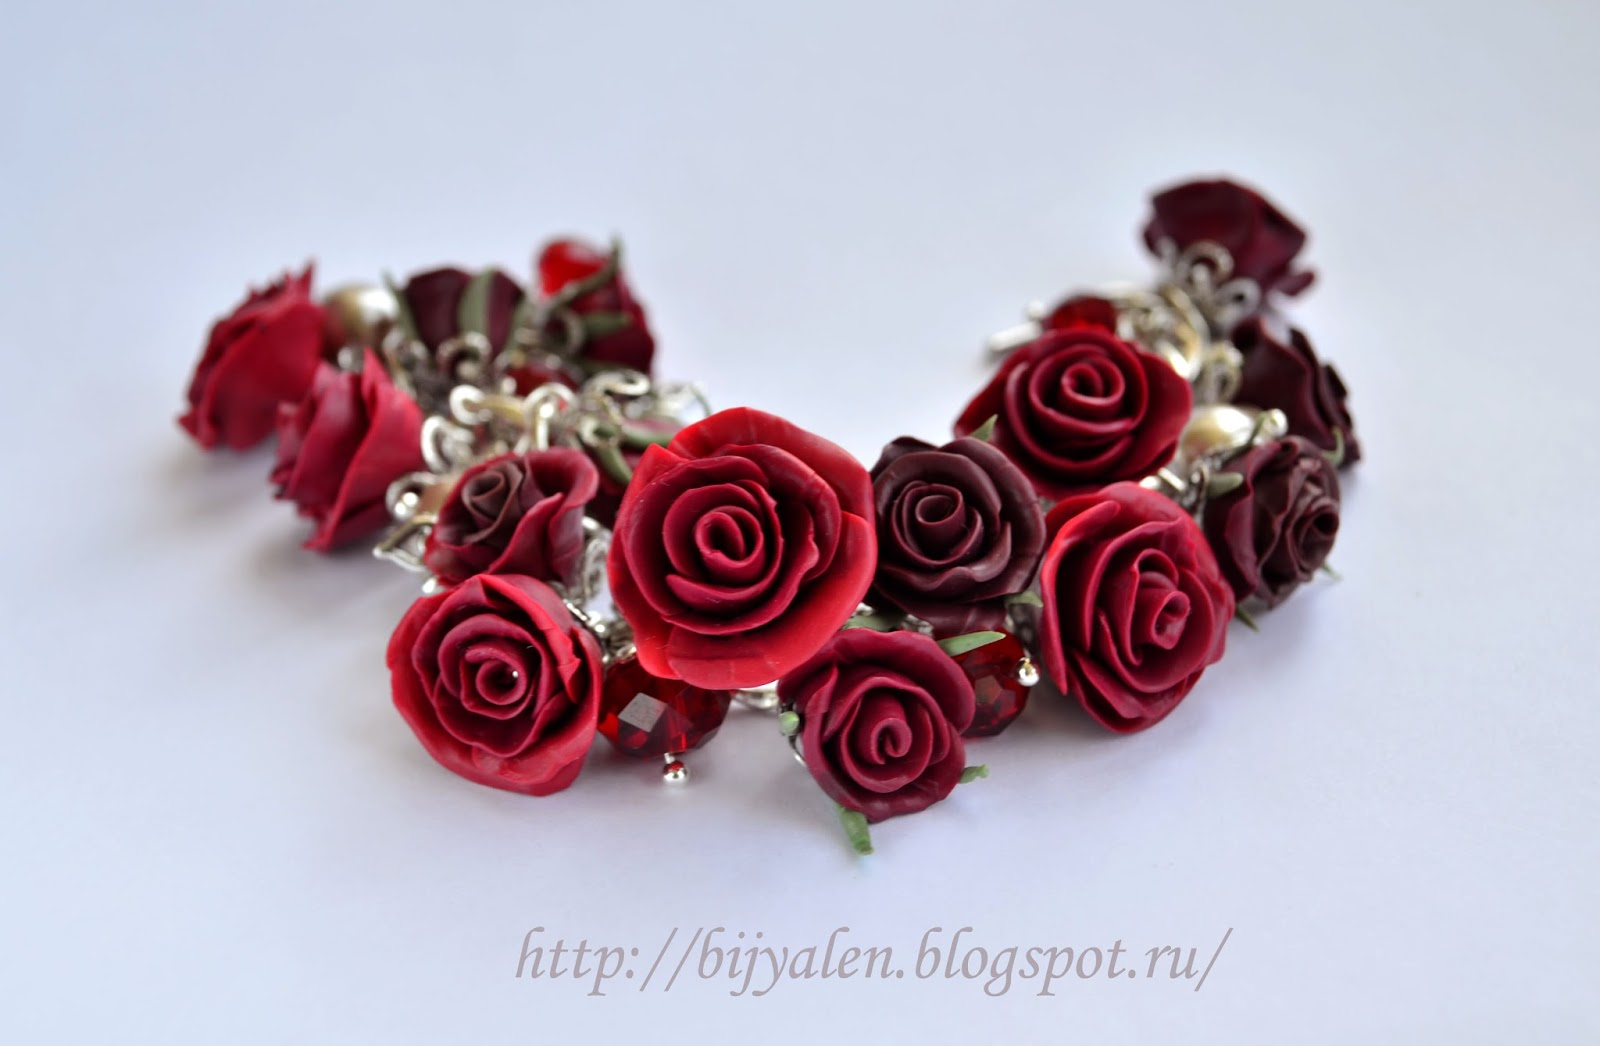 Браслеты с розами своими руками фото 648